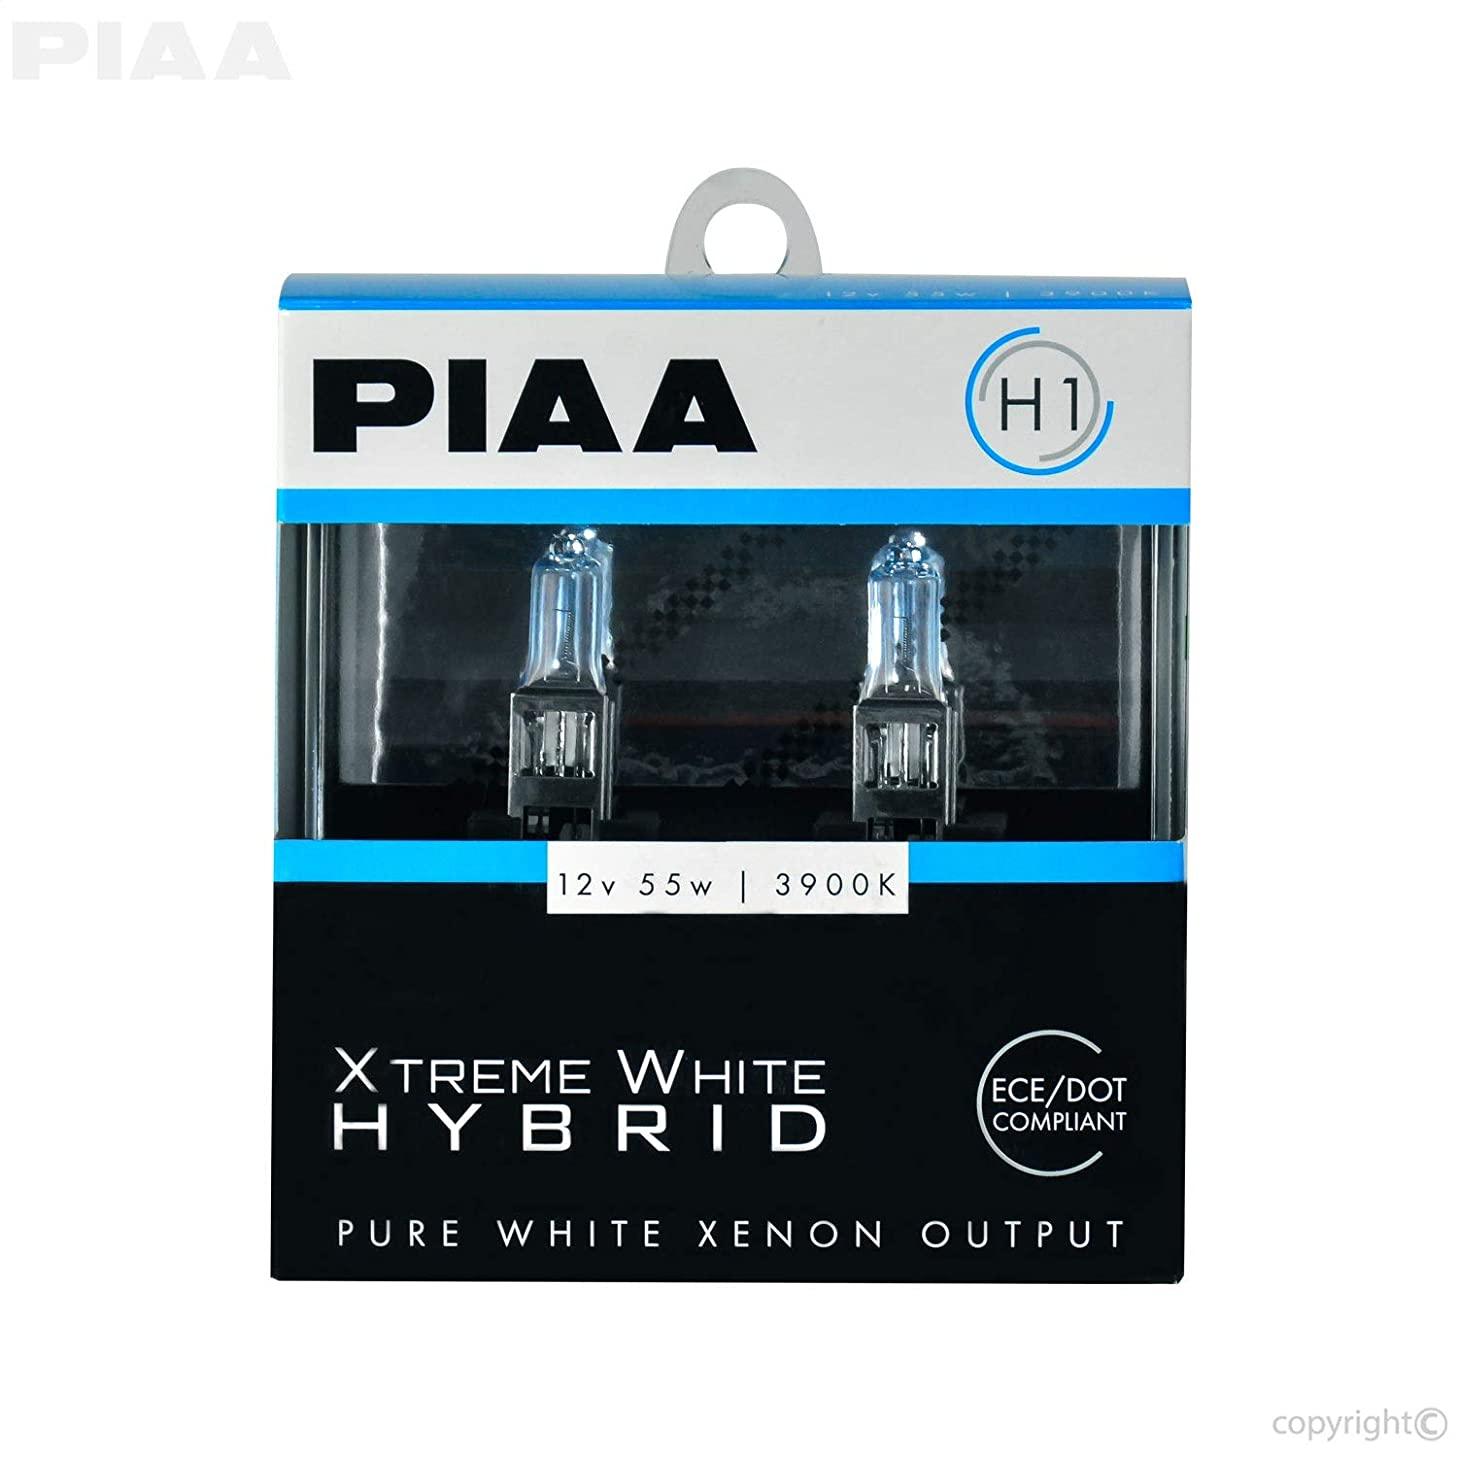 PIAA 23-10101 H1 Xtreme White Hybrid Bulb, 3900K-12V 55W-Twin, 2 Pack